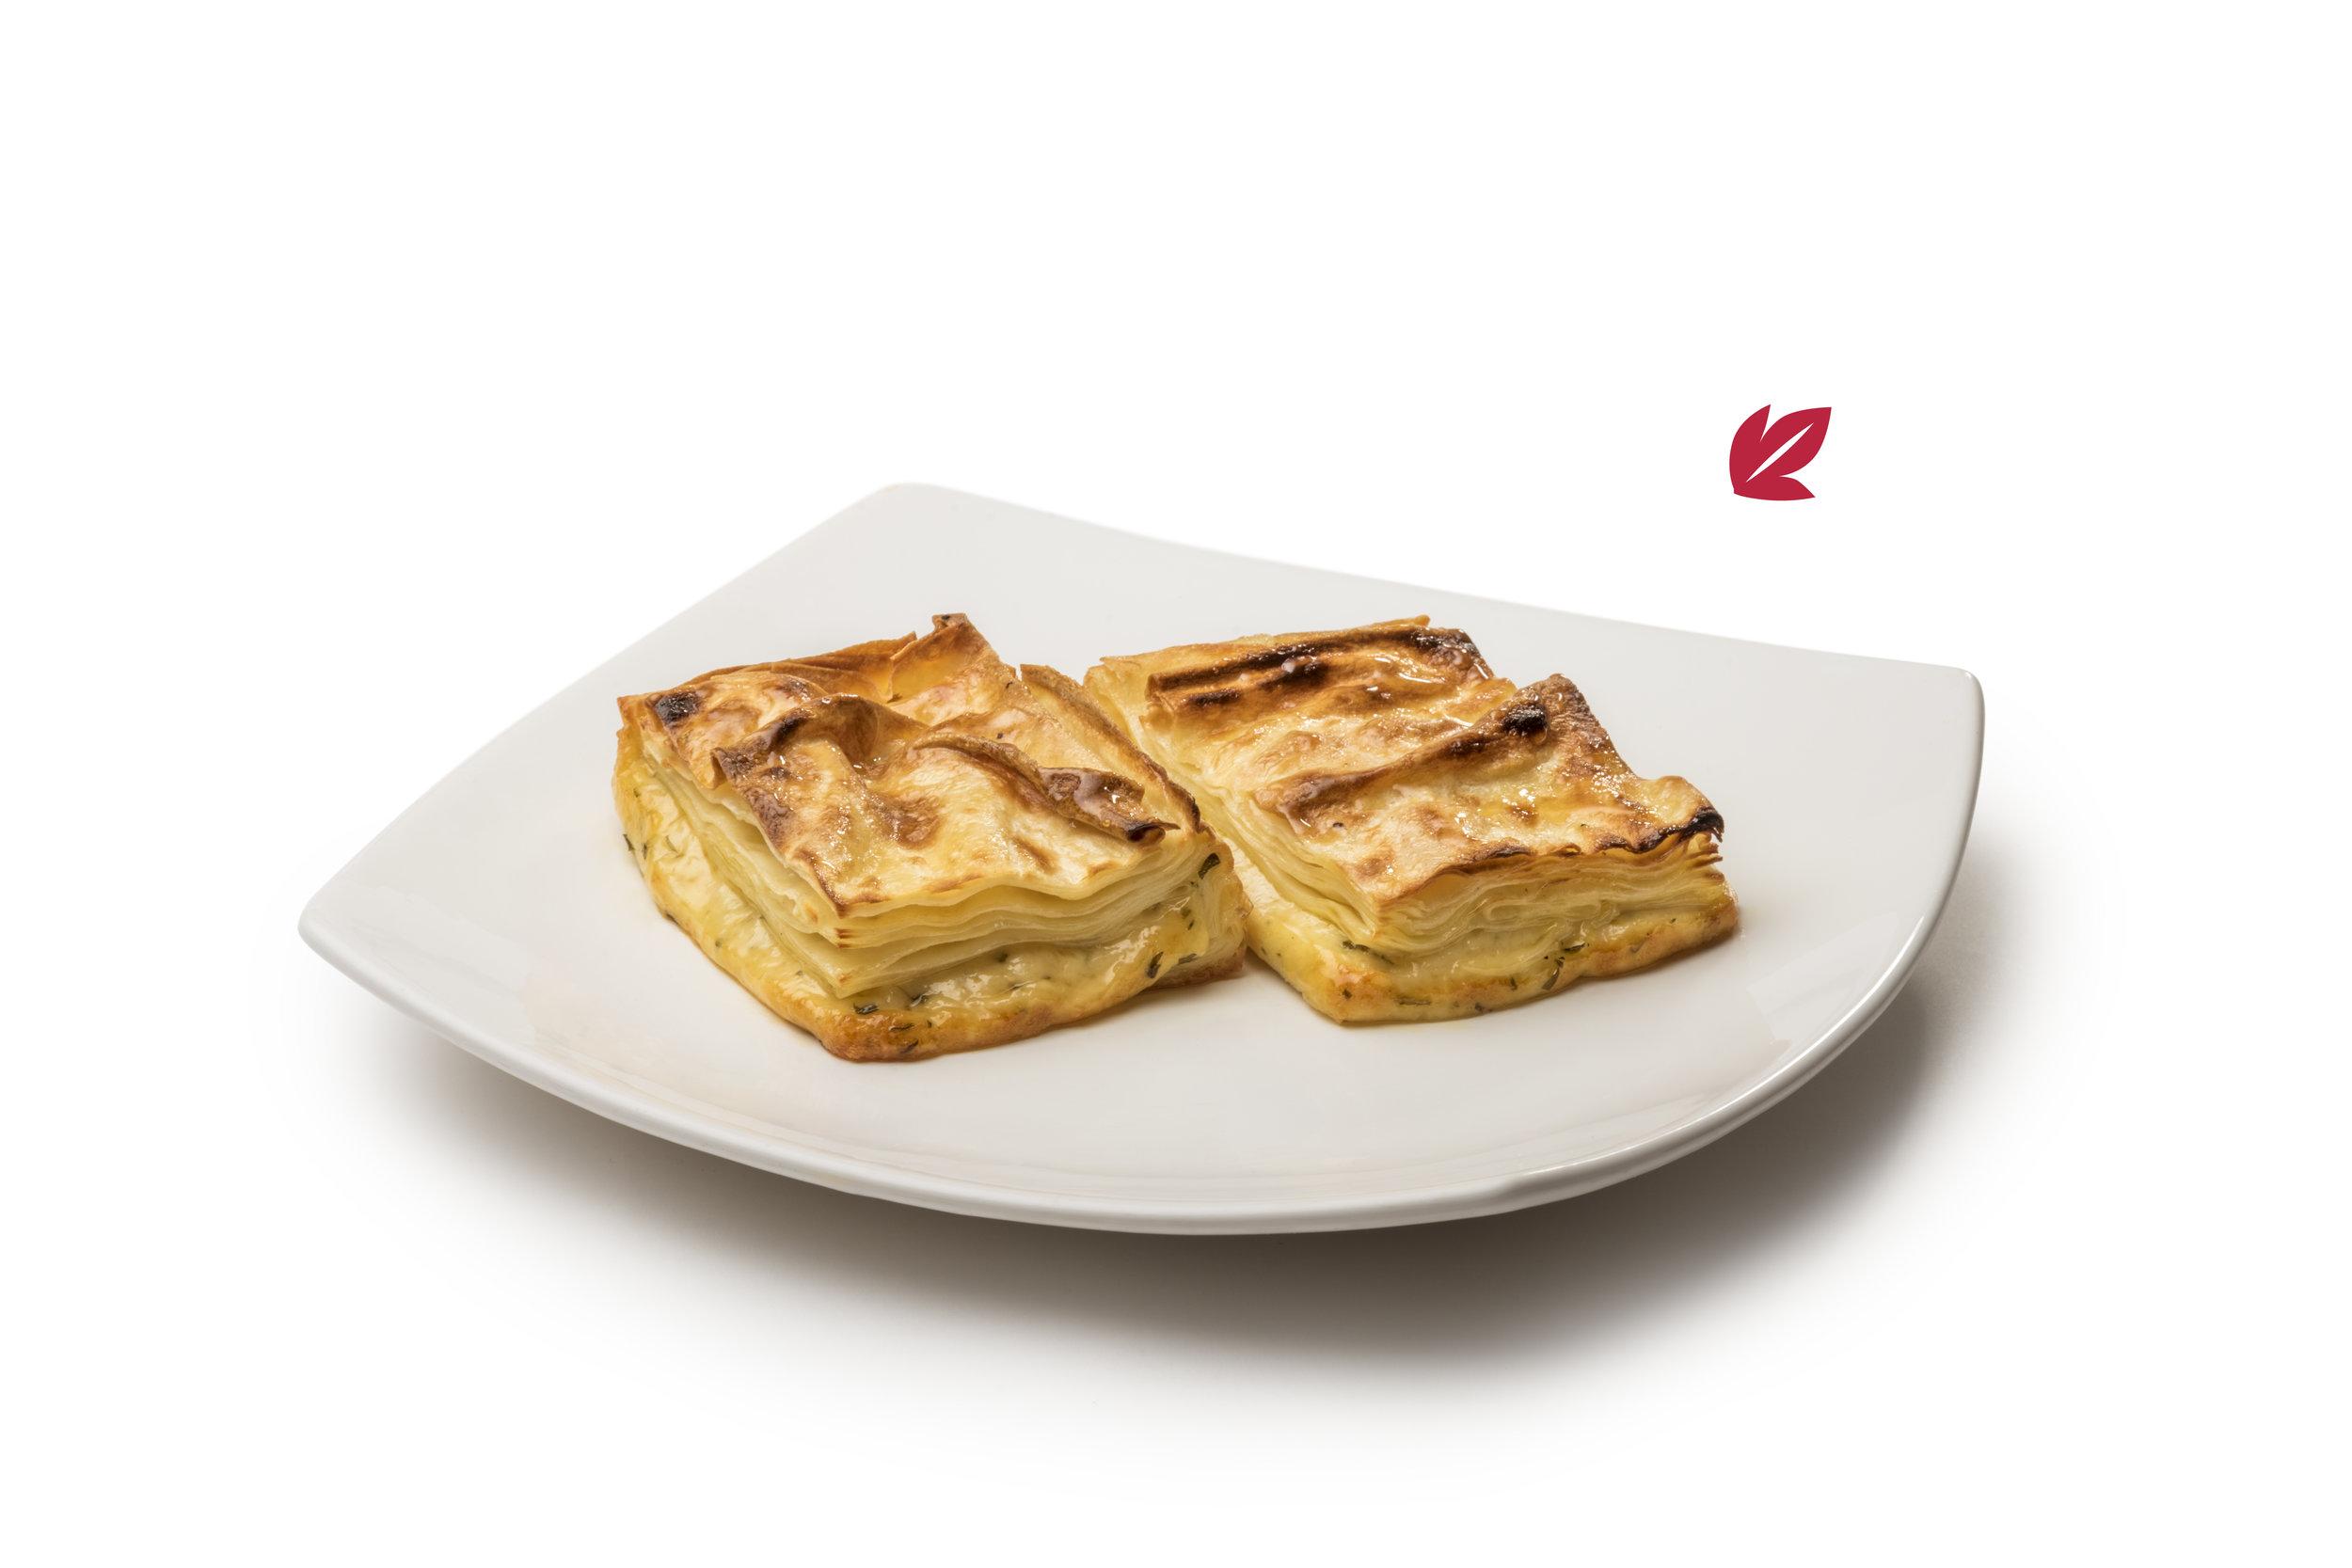 Boerek - Torta tipo lasagna, varias capas finas de masa al agua rellena de queso.$340